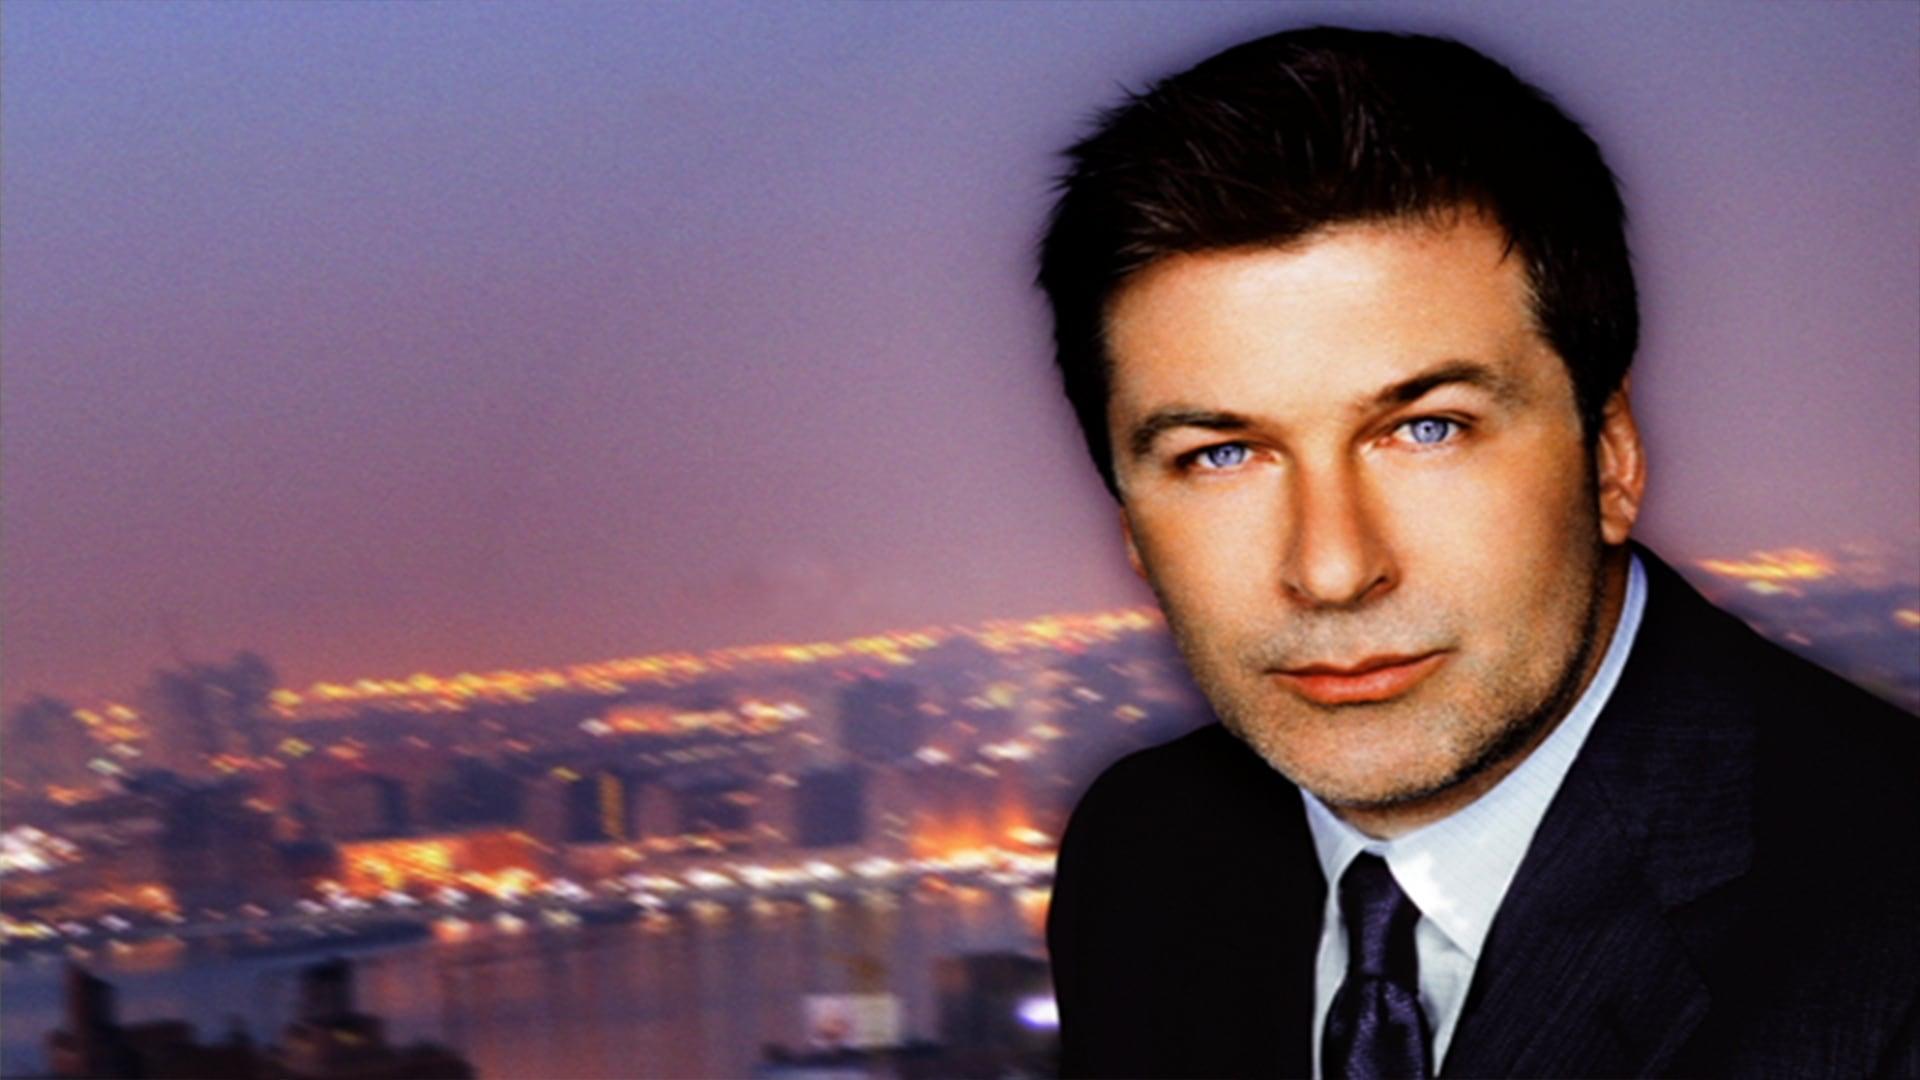 Alec Baldwin: April 20, 2002